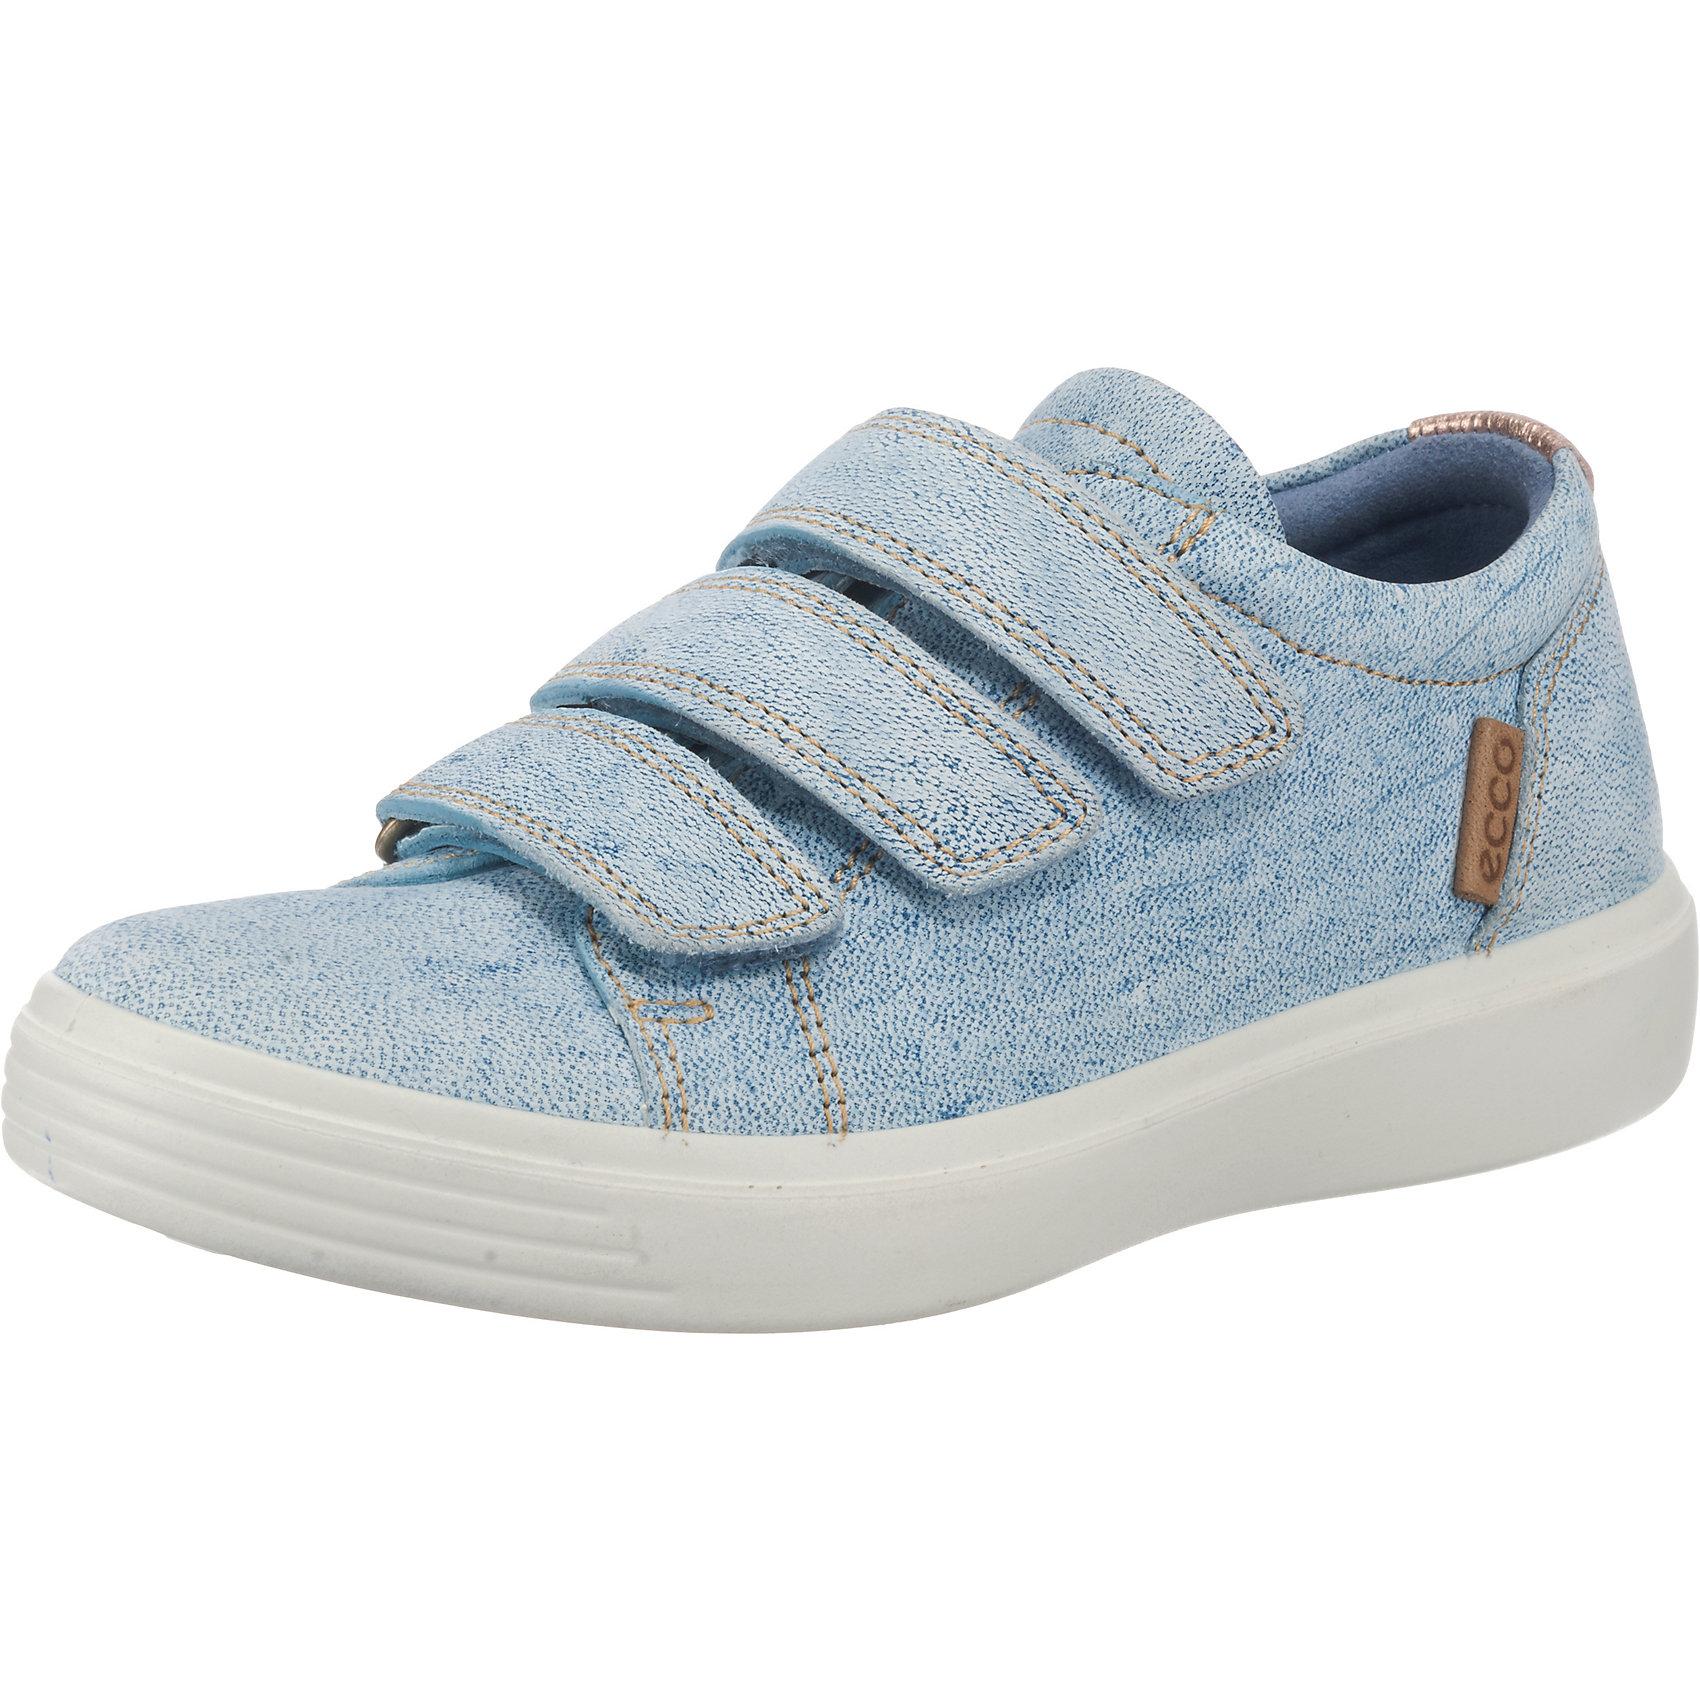 Neu-ecco-Sneakers-Low-fuer-Maedchen-7155874-fuer-